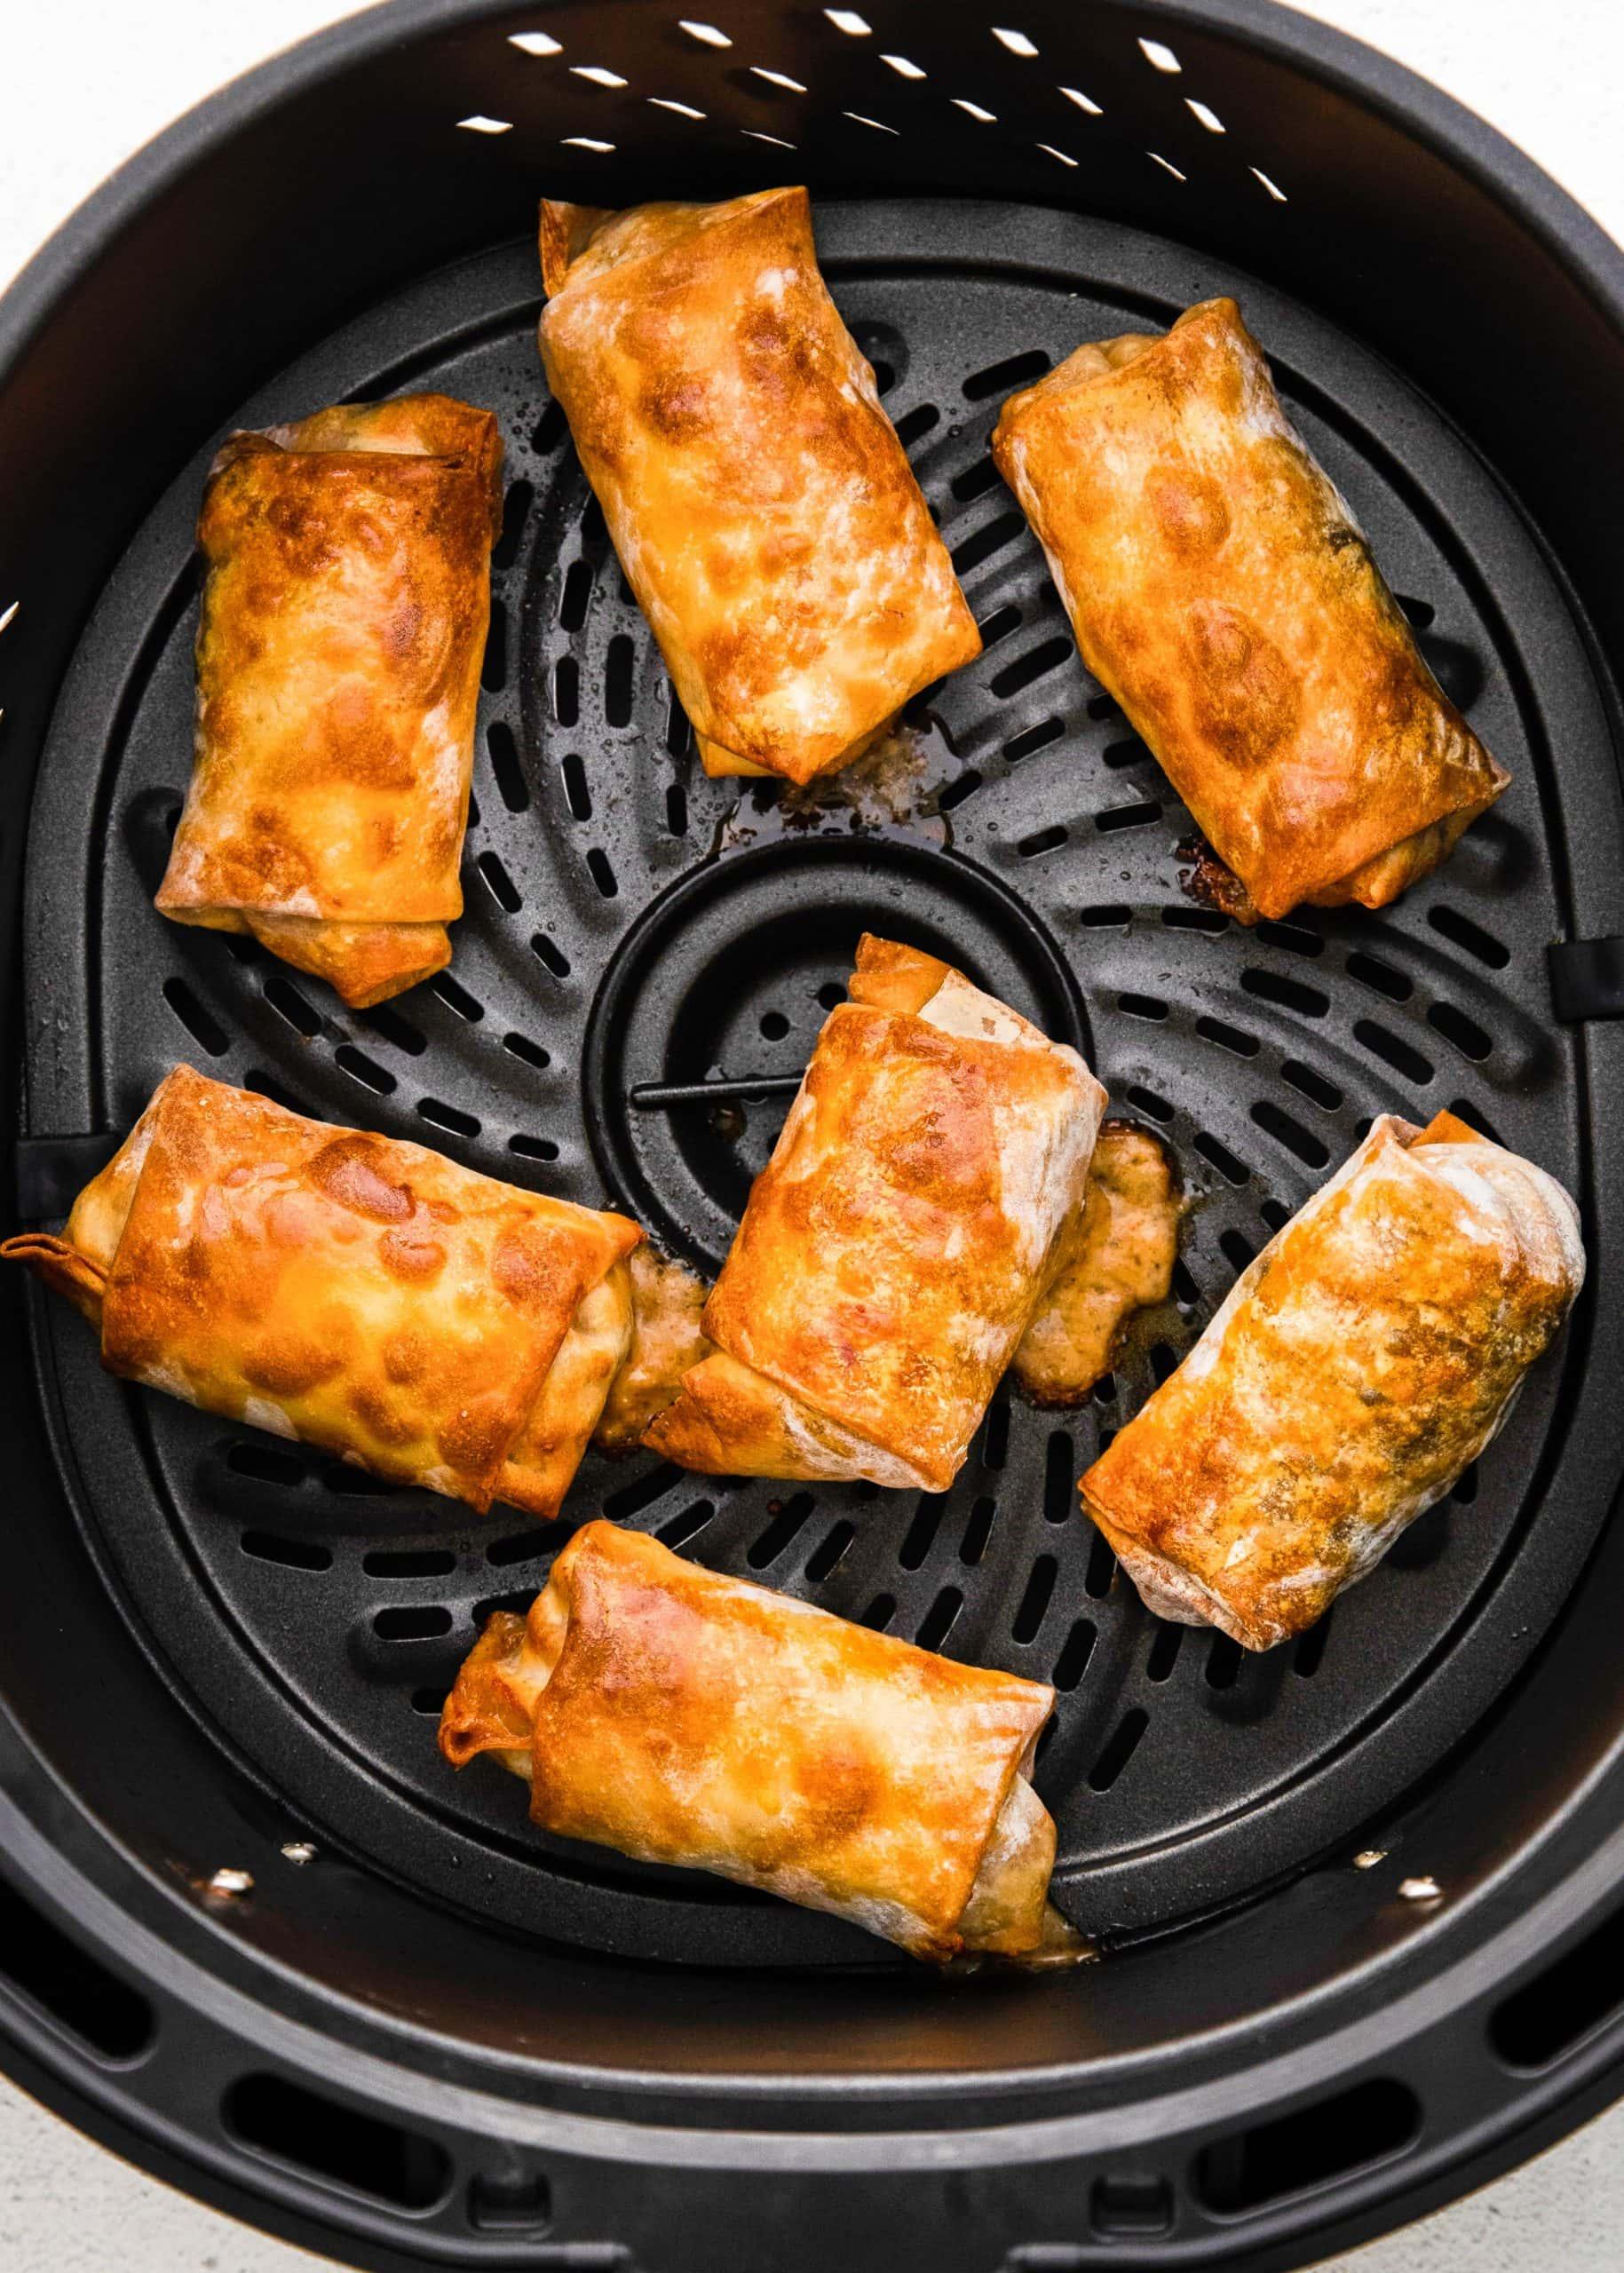 cooked egg rolls in air fryer basket